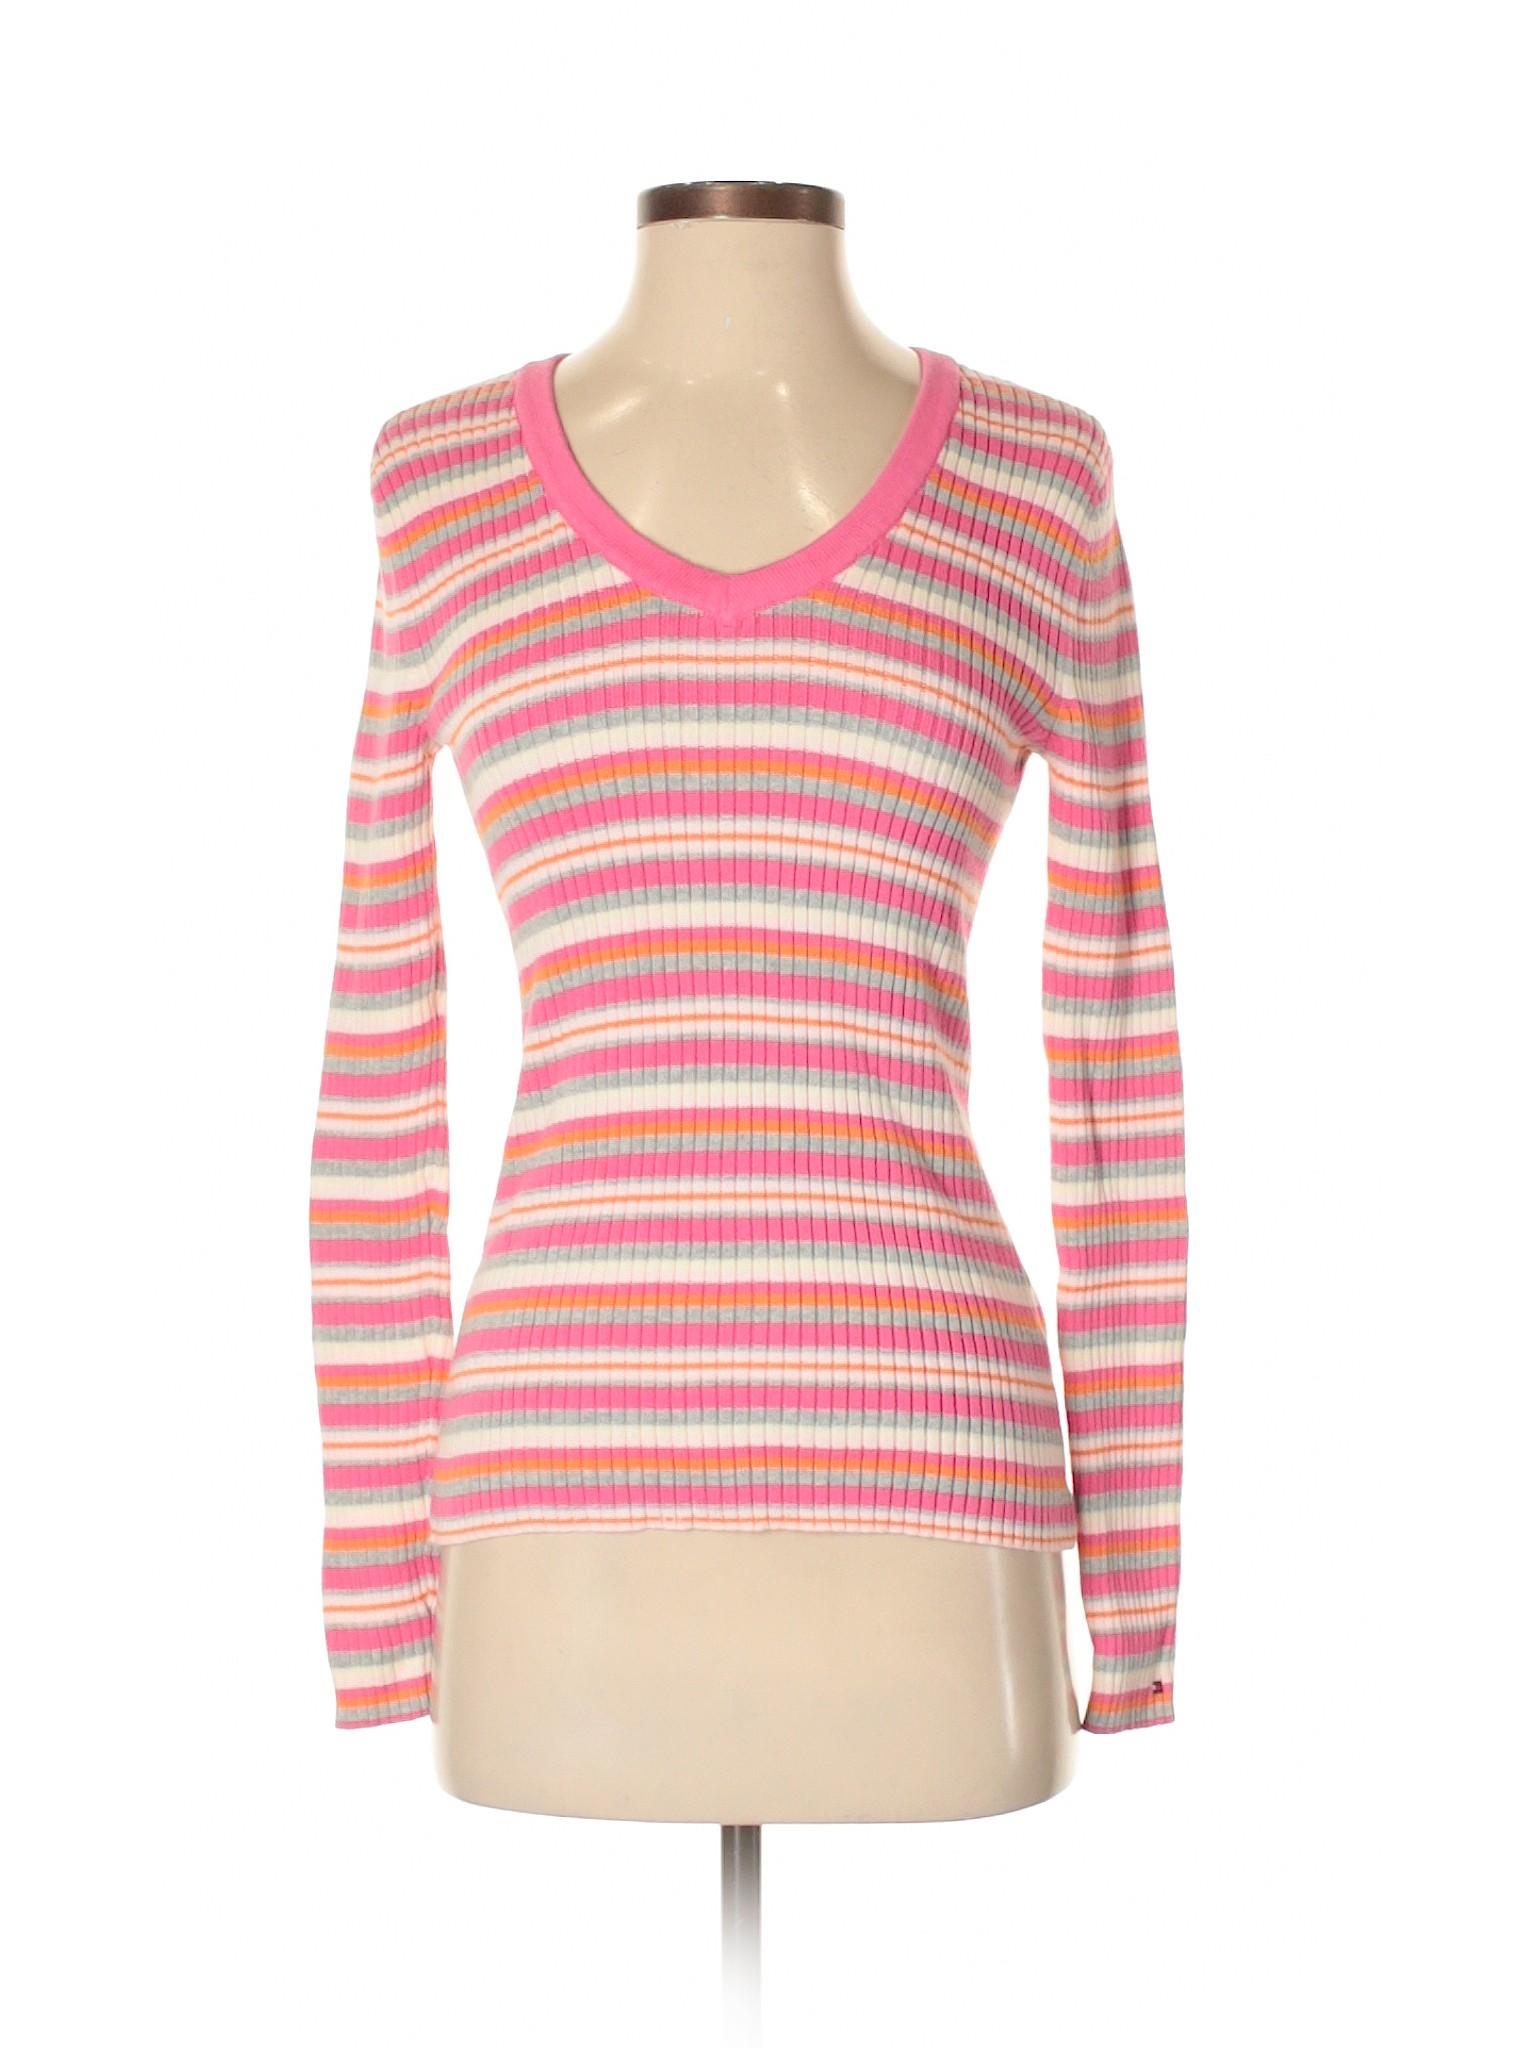 Boutique Tommy Boutique Pullover Hilfiger Tommy Hilfiger Pullover Sweater Sweater 45qxPvnw6